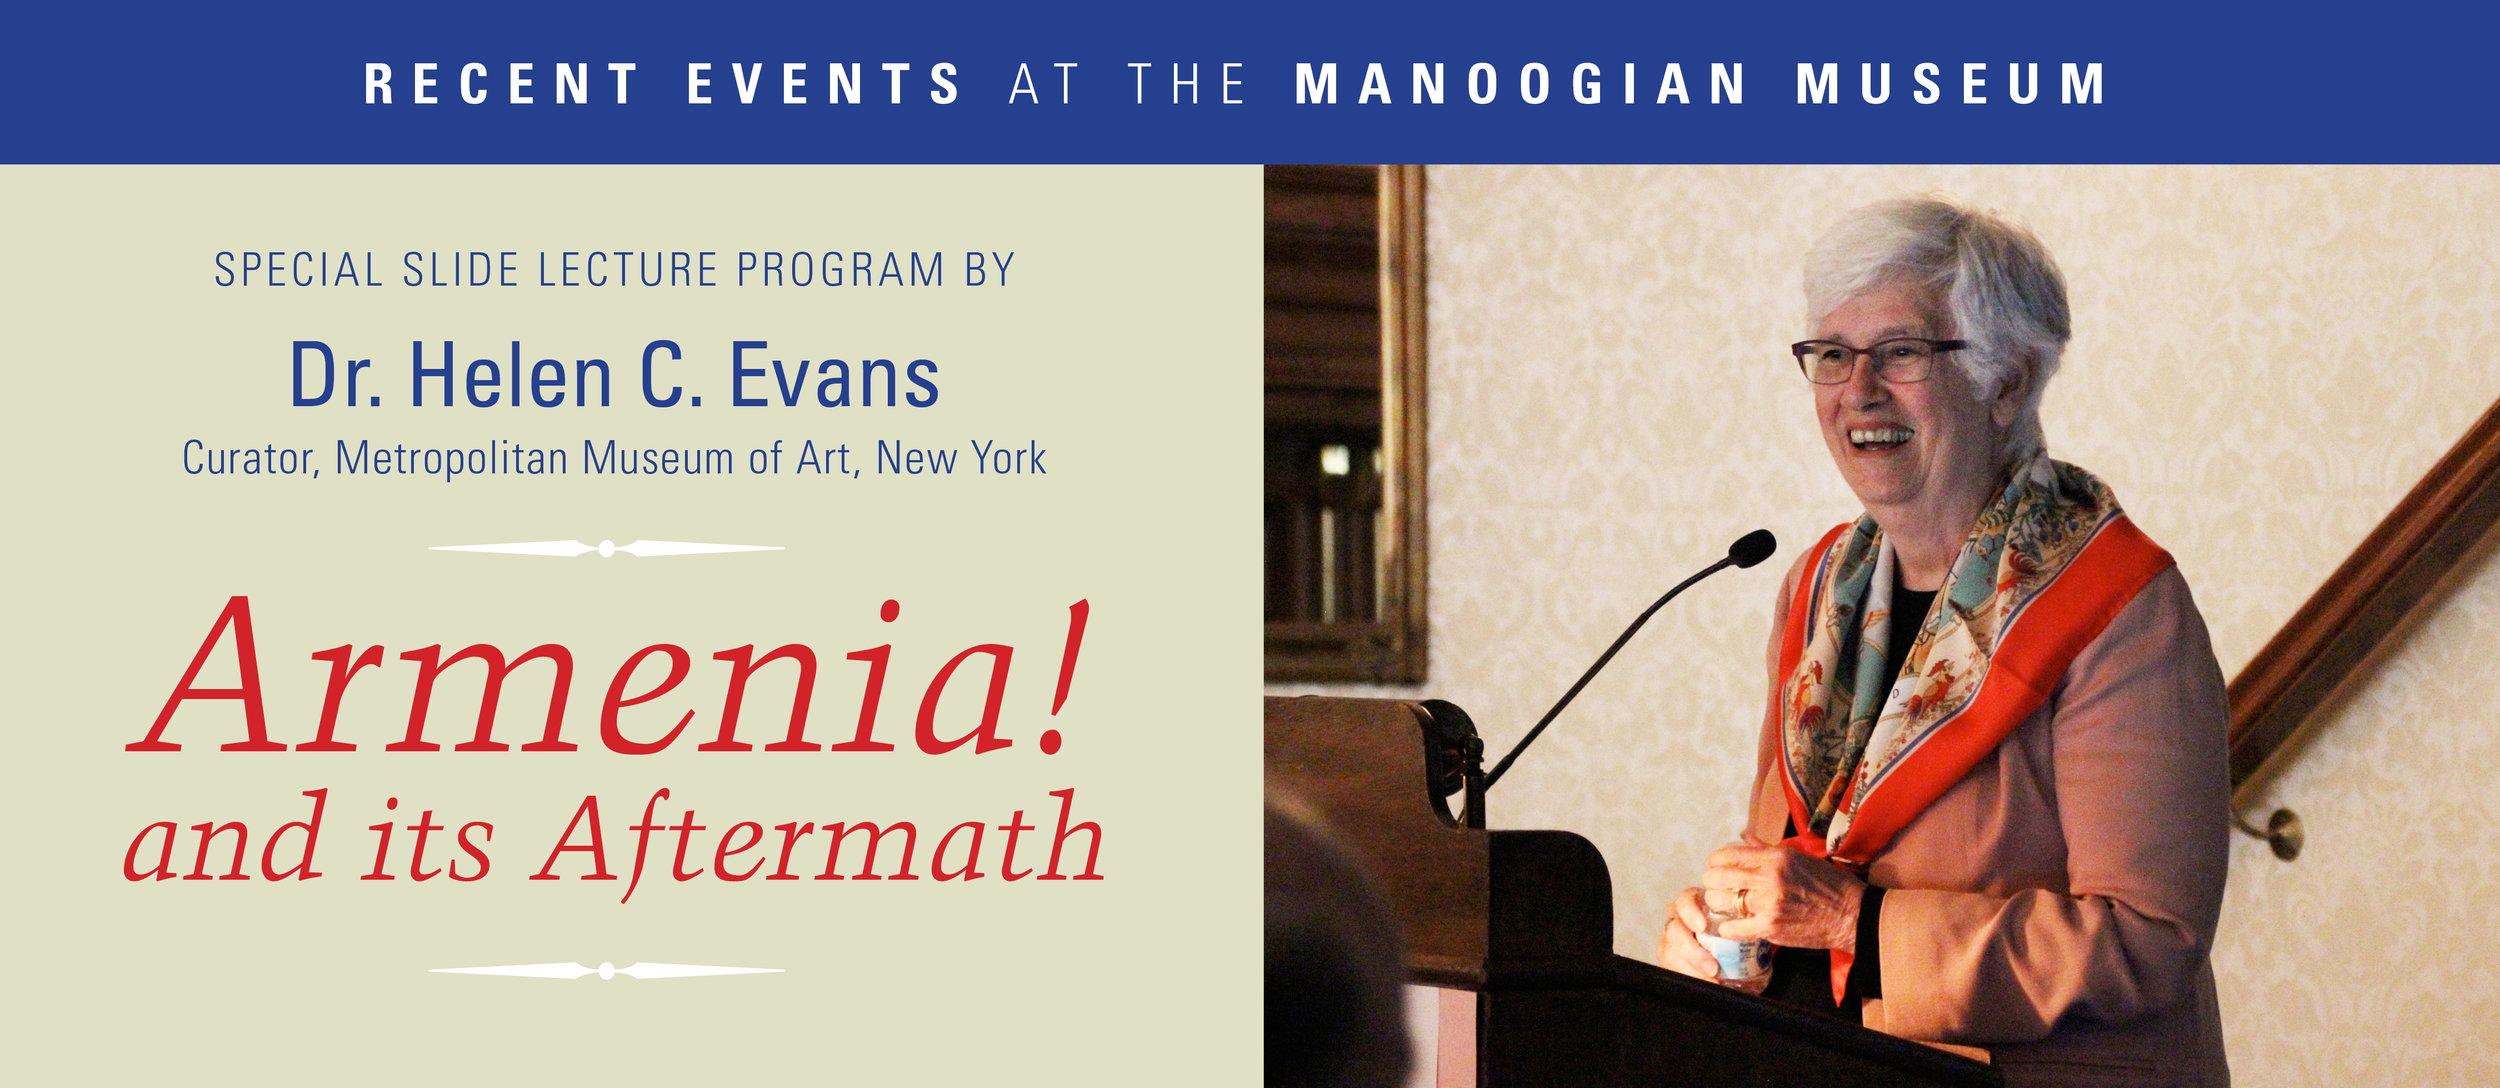 Evans Event Web Banner.jpg